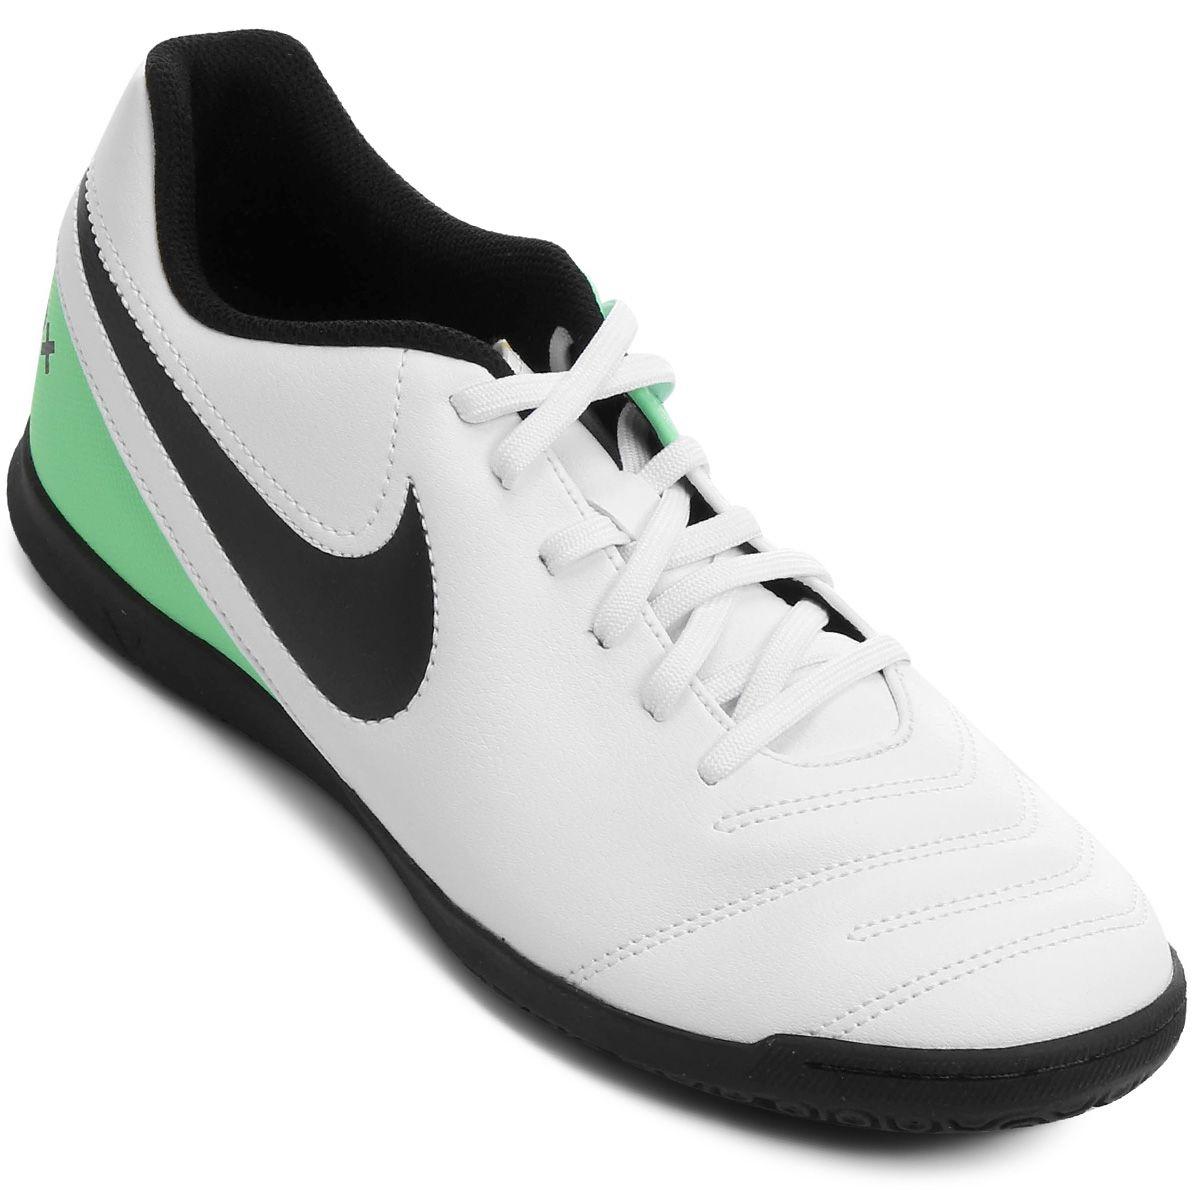 0b48dbc4d5 Chuteira Futsal Nike Tiempo Rio 3 IC Masculina - BRACIA SHOP  Loja ...